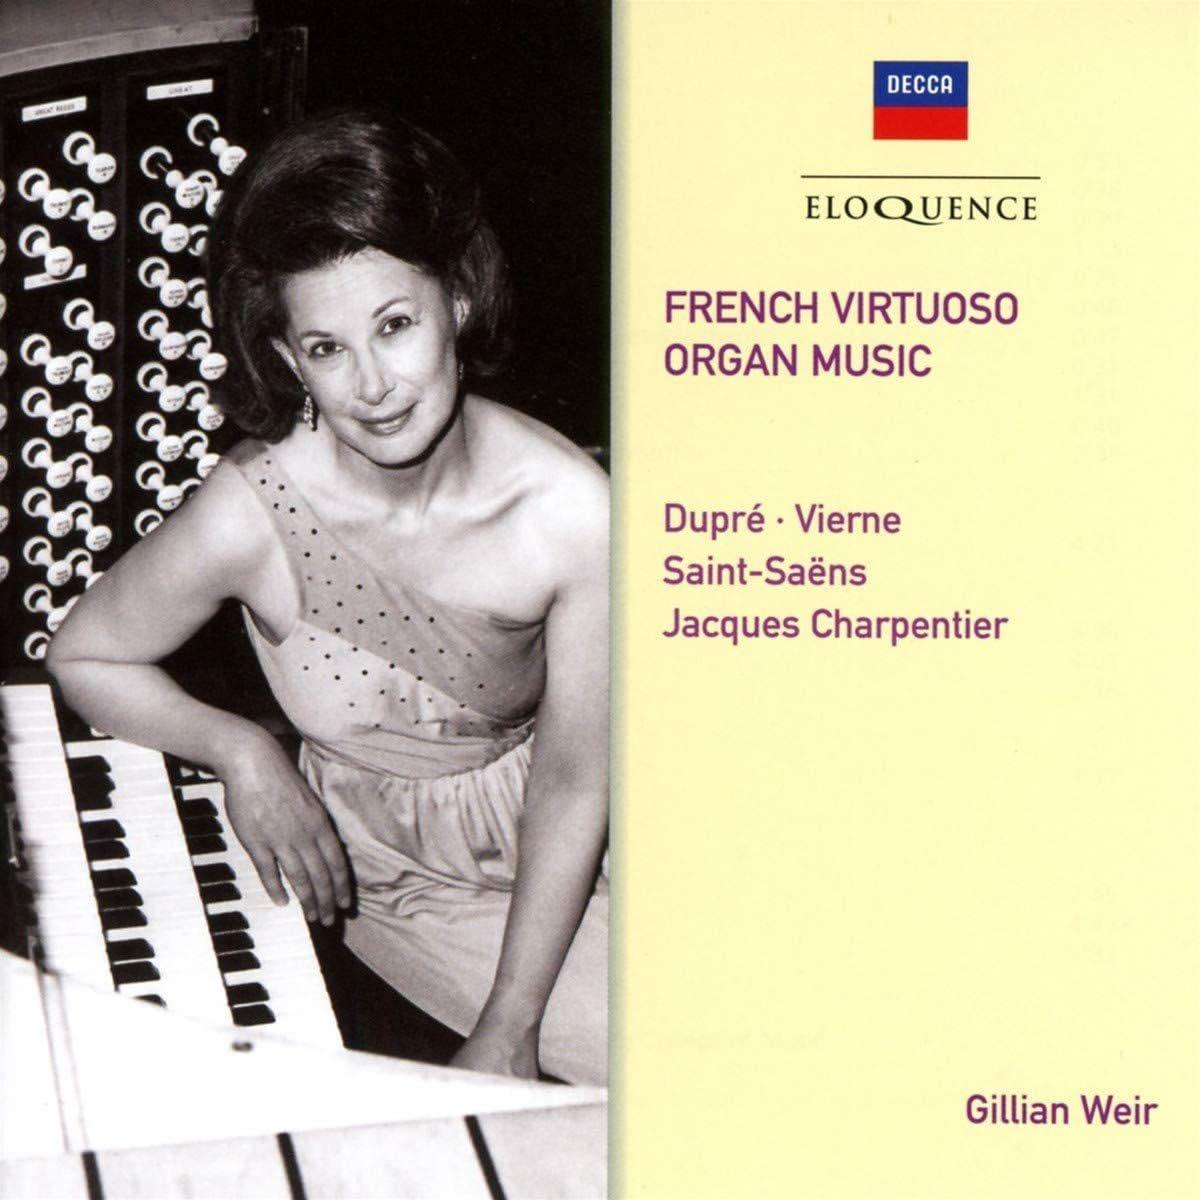 Photo No.1 of French Virtuoso Organ Music